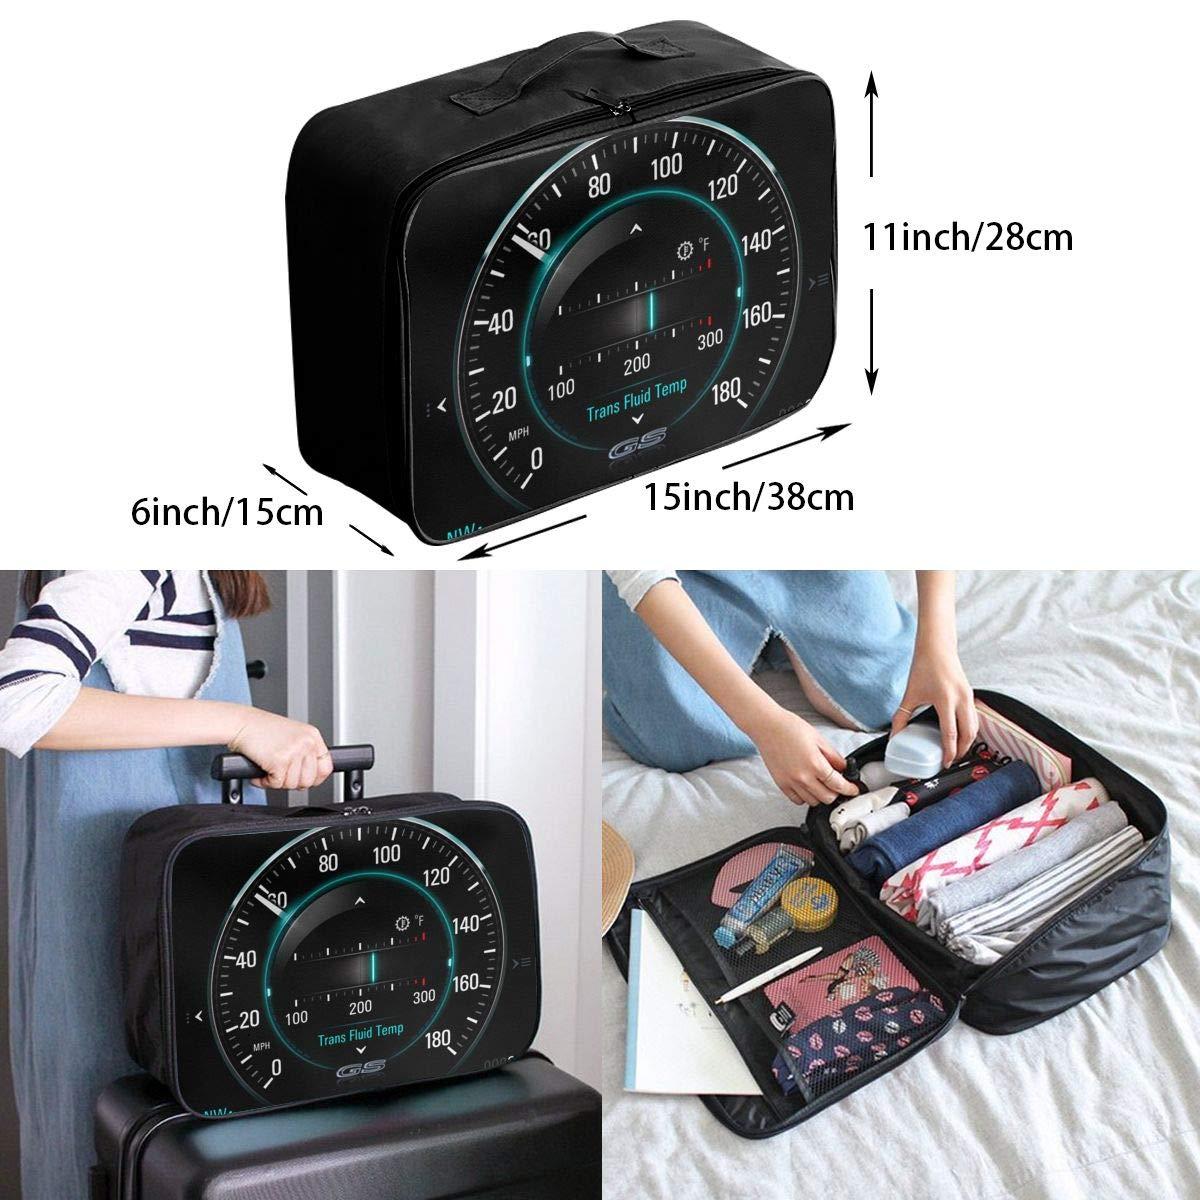 Travel Luggage Duffle Bag Lightweight Portable Handbag Yoga Large Capacity Waterproof Foldable Storage Tote